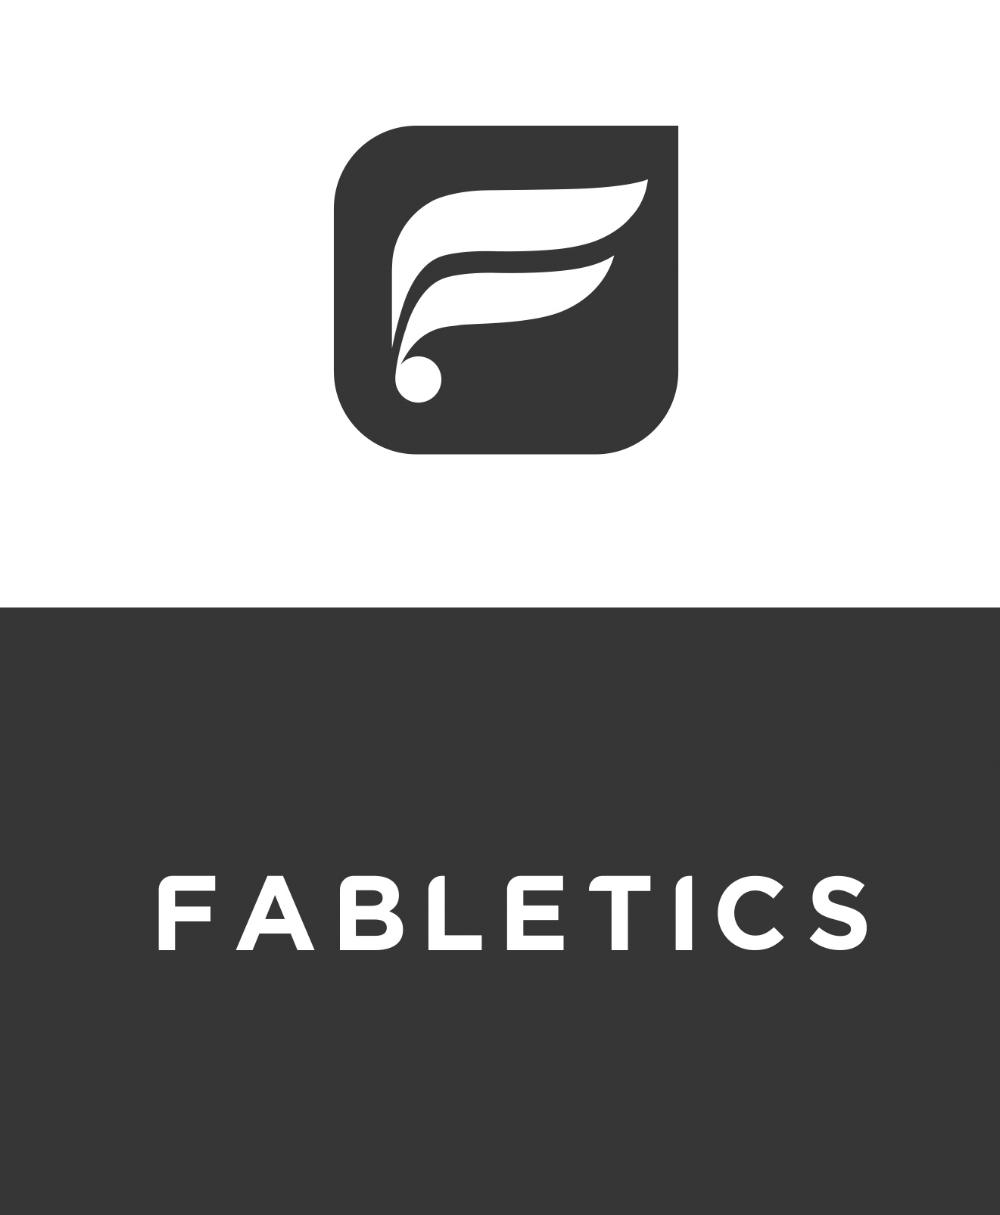 fabletics_logo_mock